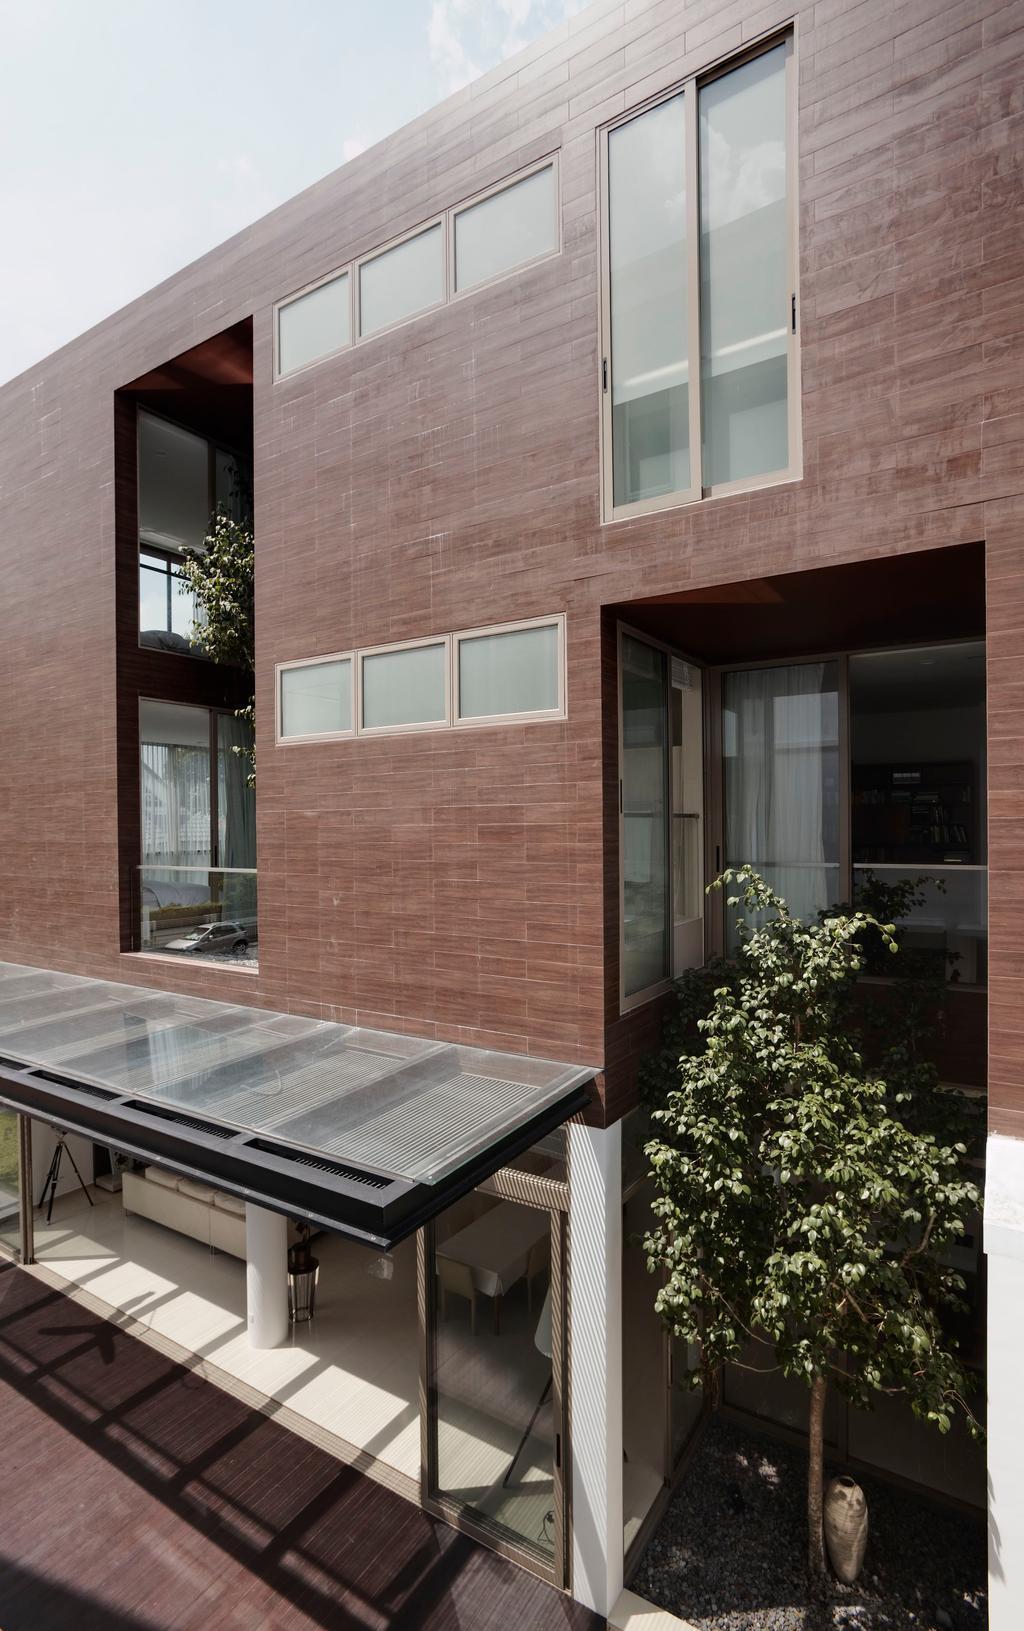 Modern, Landed, 21 Jalan Mariam, Architect, Lim Ai Tiong (LATO) Architects, Flora, Jar, Plant, Potted Plant, Pottery, Vase, Brick, Porch